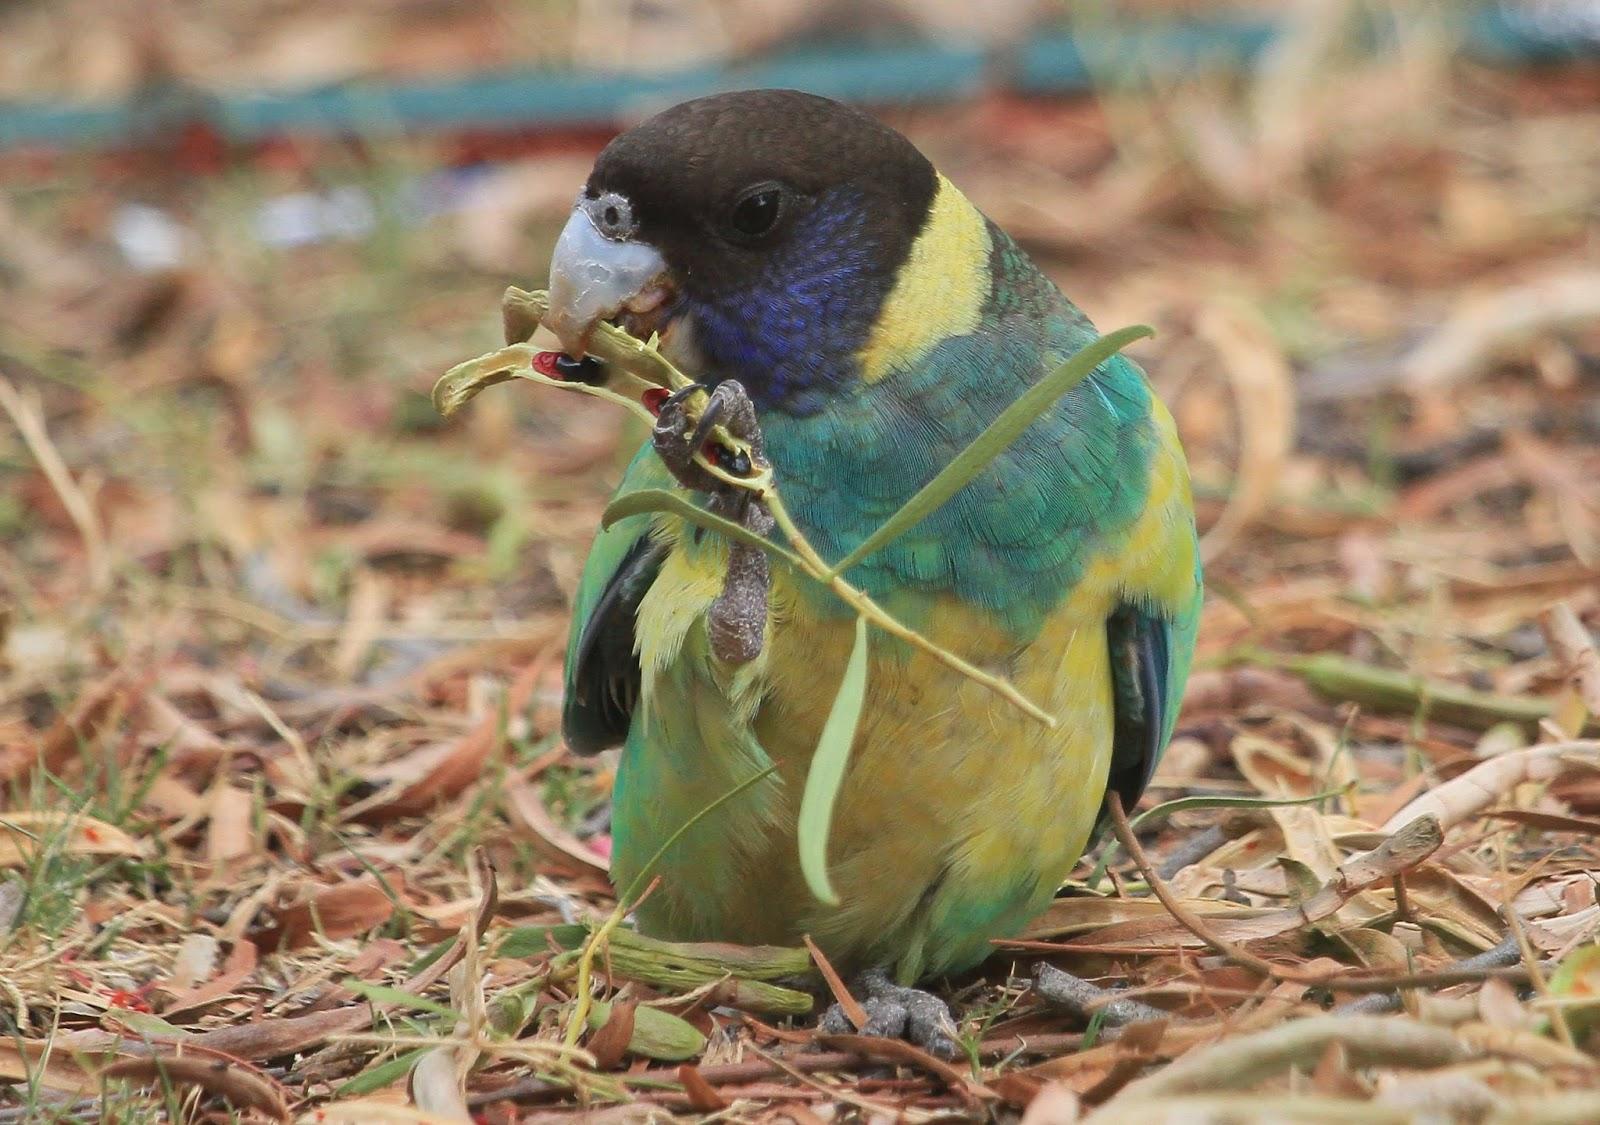 Richard Waring's Birds of Australia: Backyard visitors